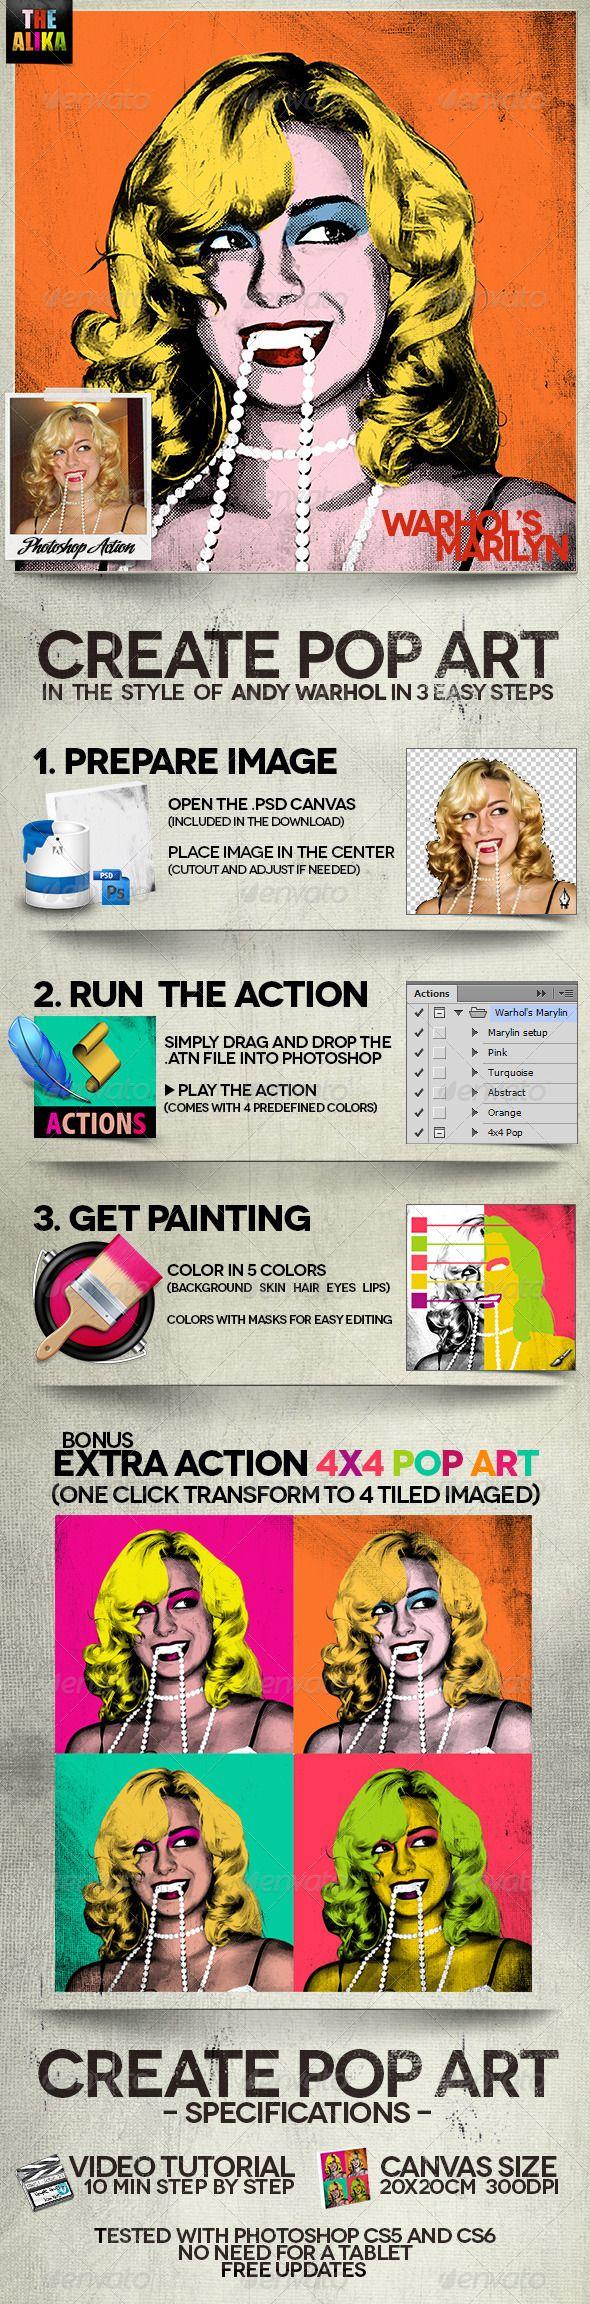 Create POP ART - Photoshop Action - Warhol Style